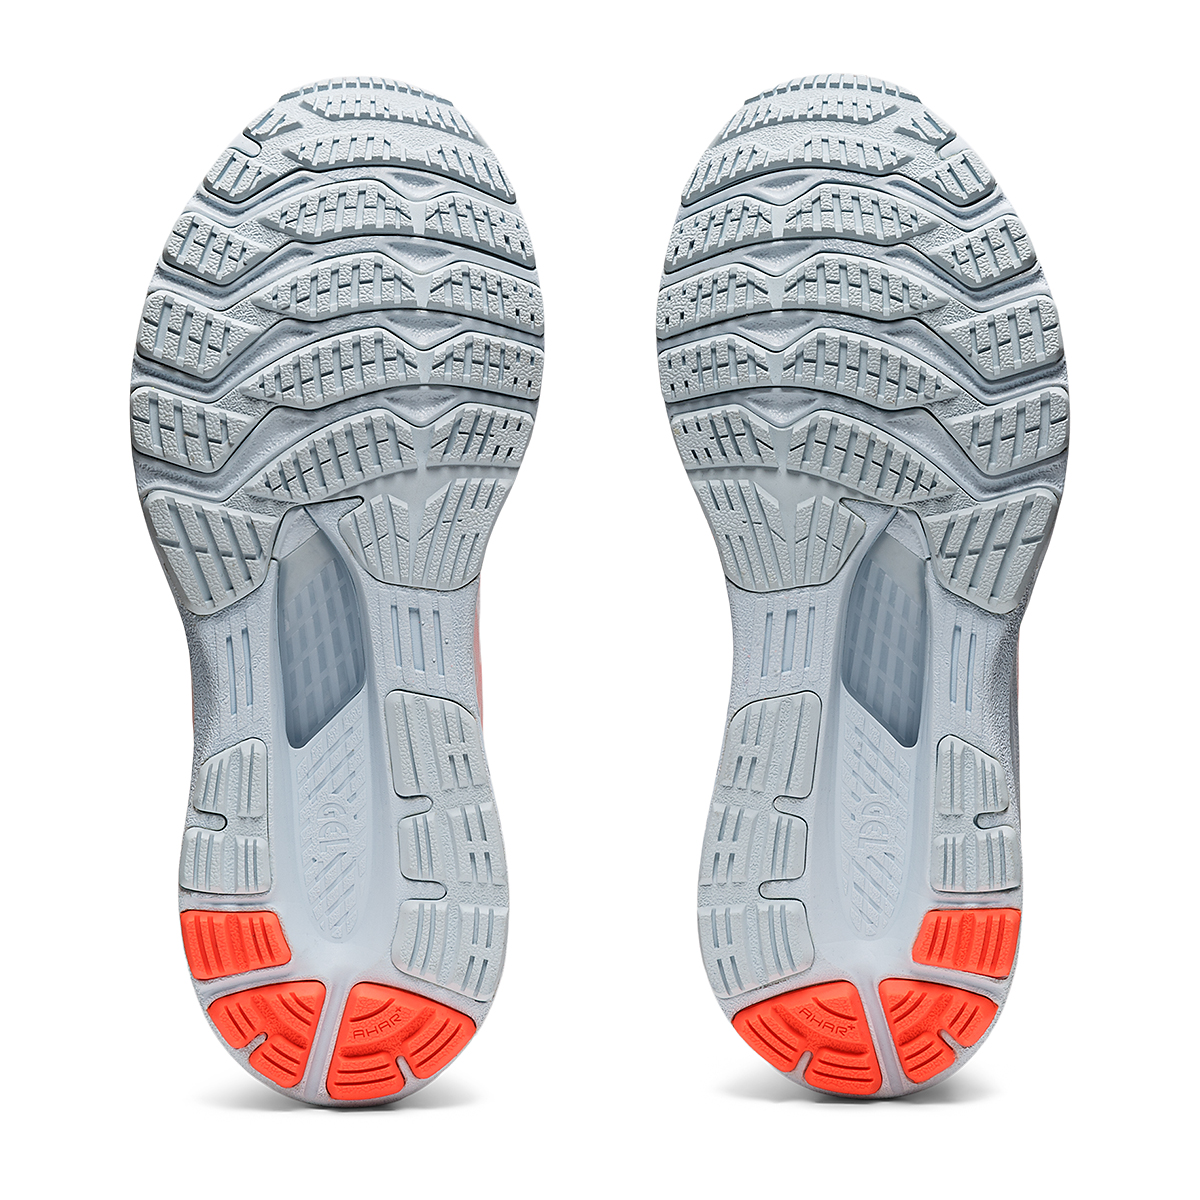 Women's Asics Gel-Kayano 28 Running Shoe - Color: White/Flash Coral - JackRabbit Exclusive - Size: 5 - Width: Regular, White/Flash Coral - JackRabbit Exclusive, large, image 7